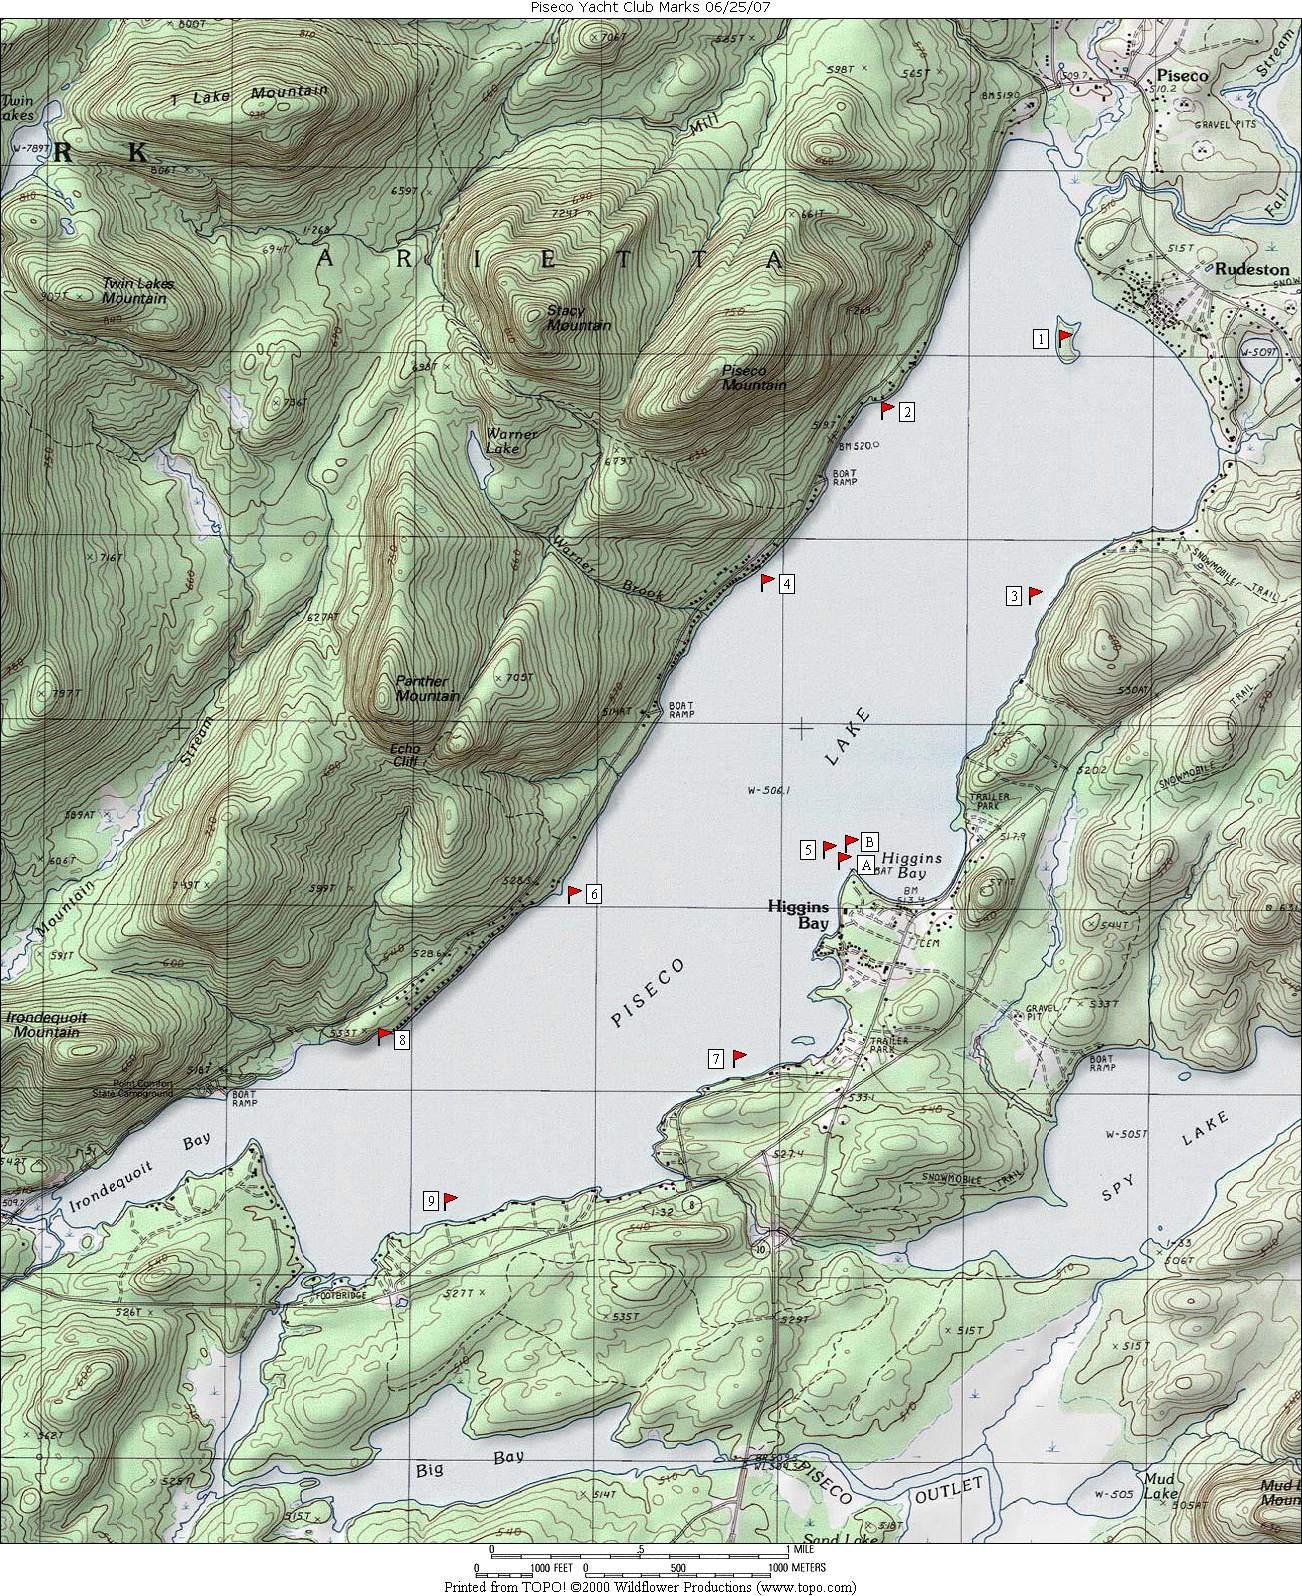 Piseco Yacht Club - Marks lake maps